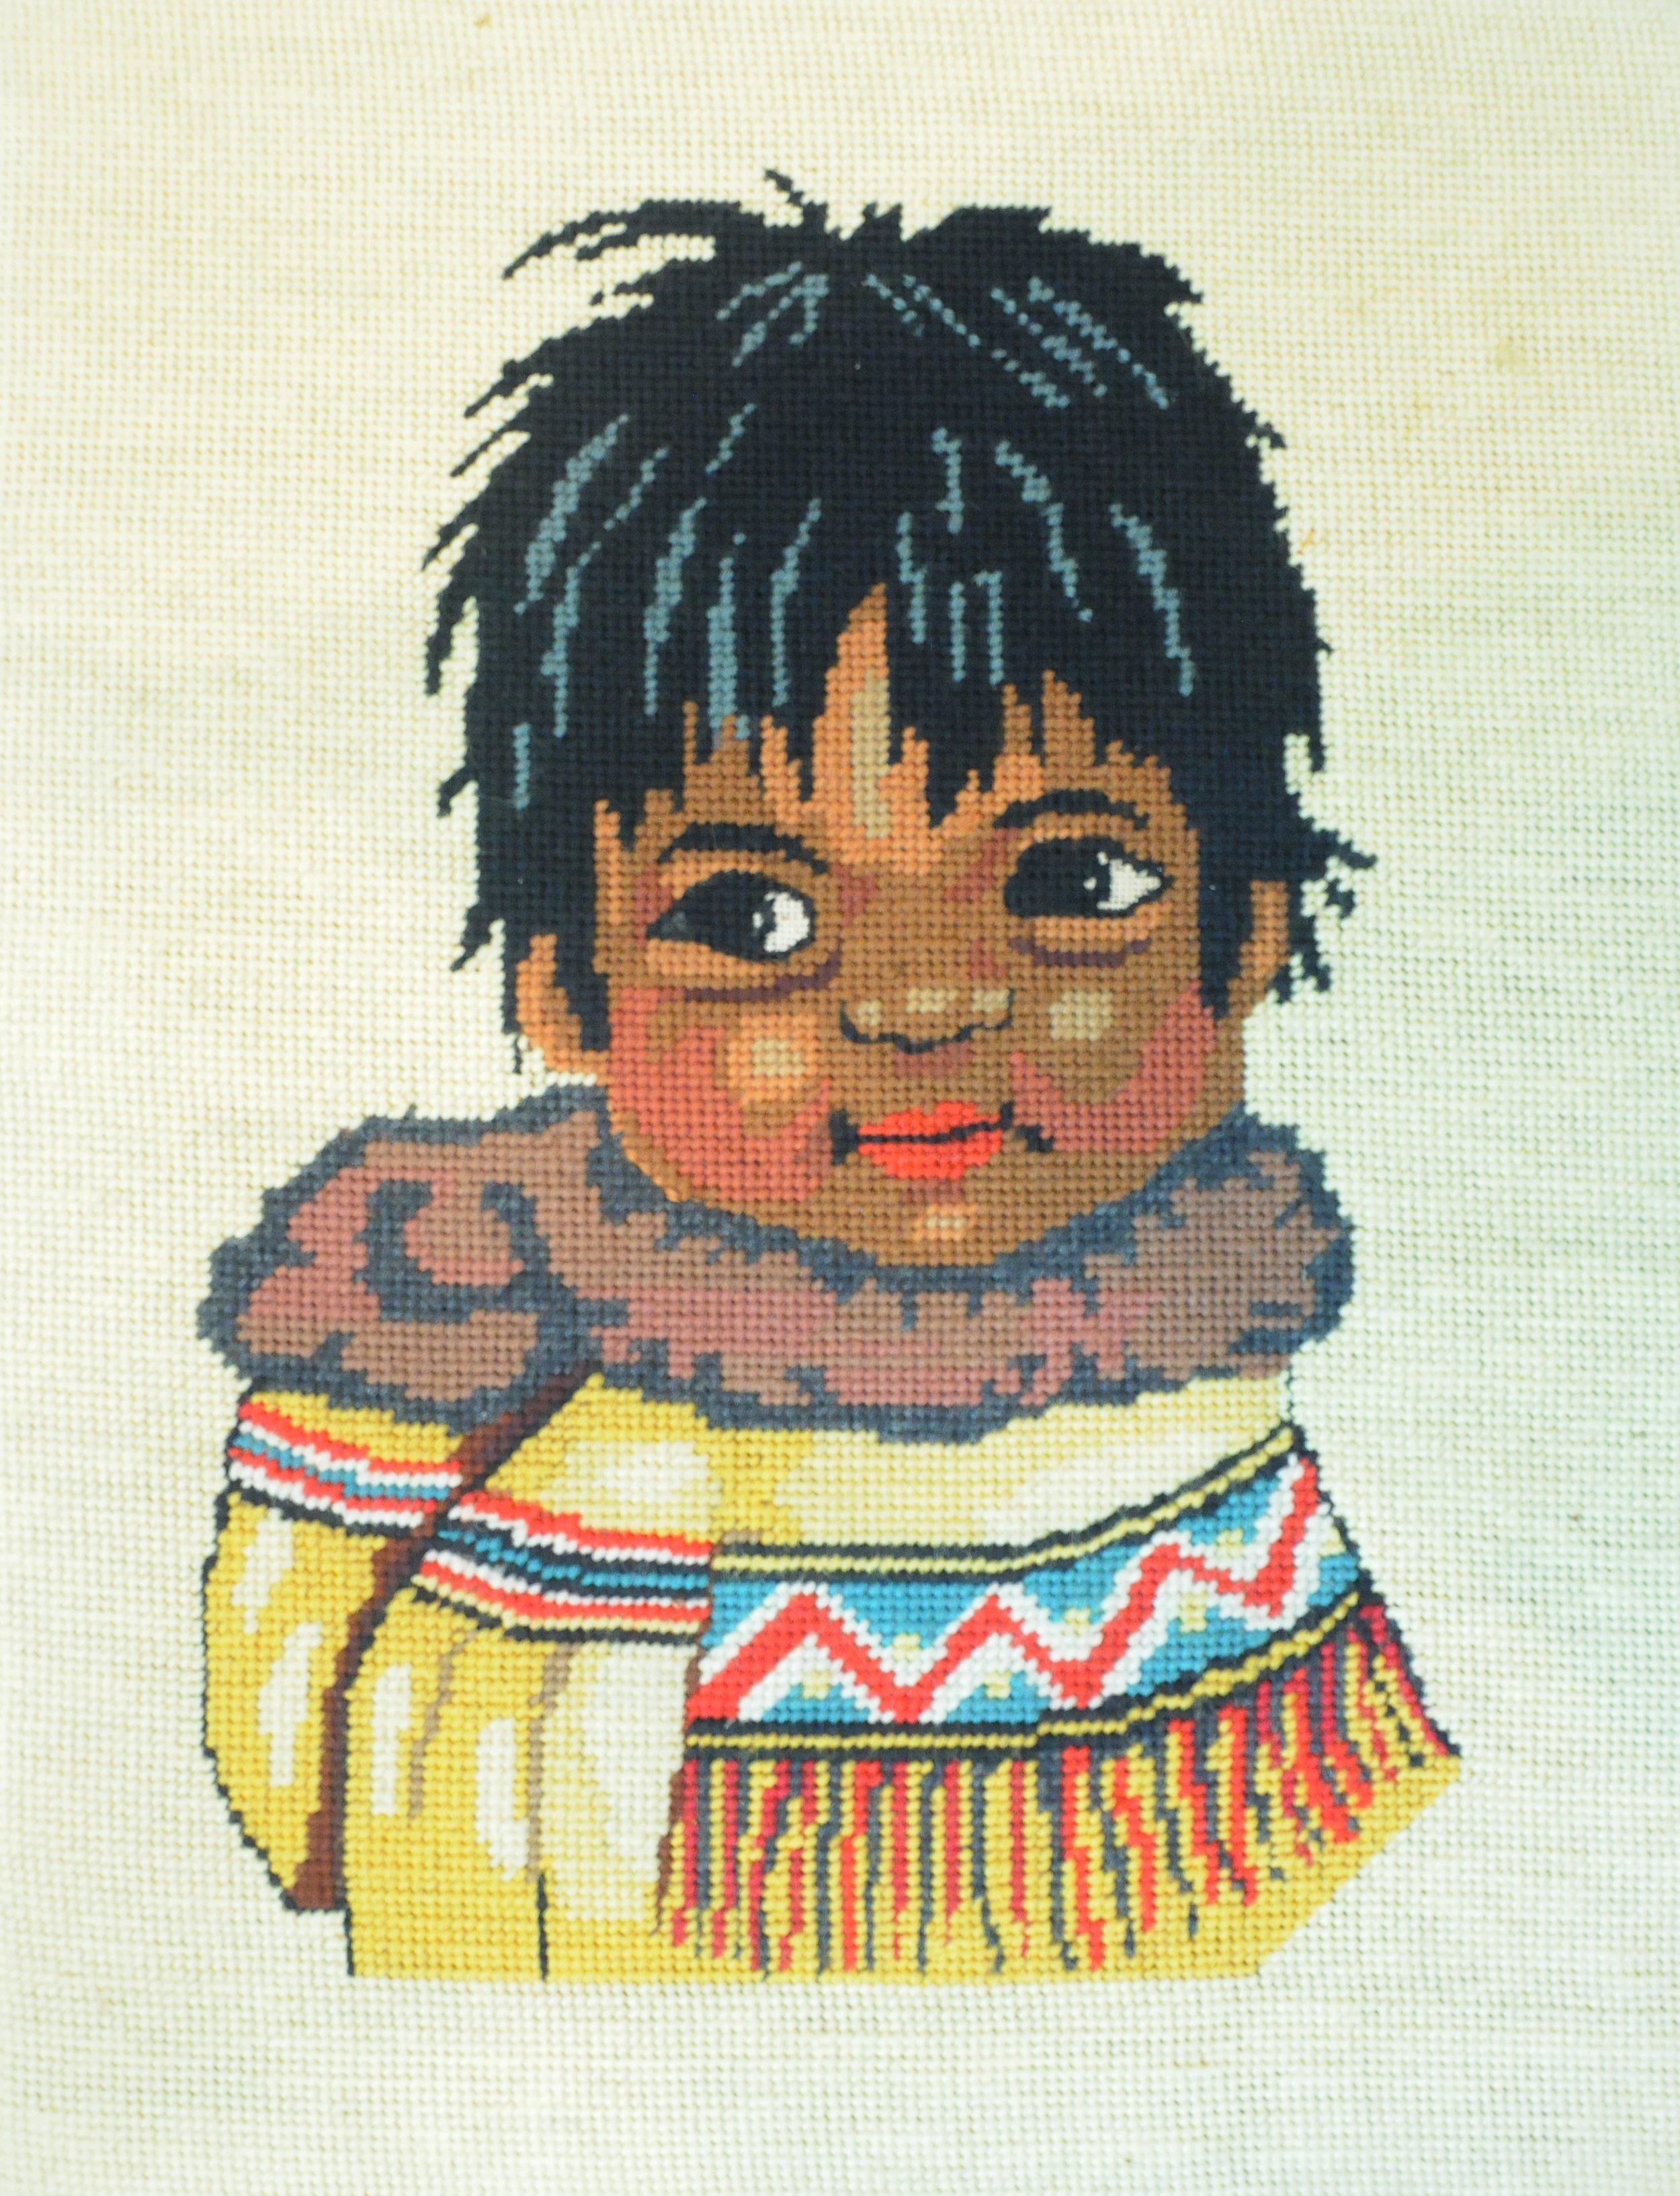 Untitled (Portrait of Child), c. 1970s, artist unknown, needlepoint